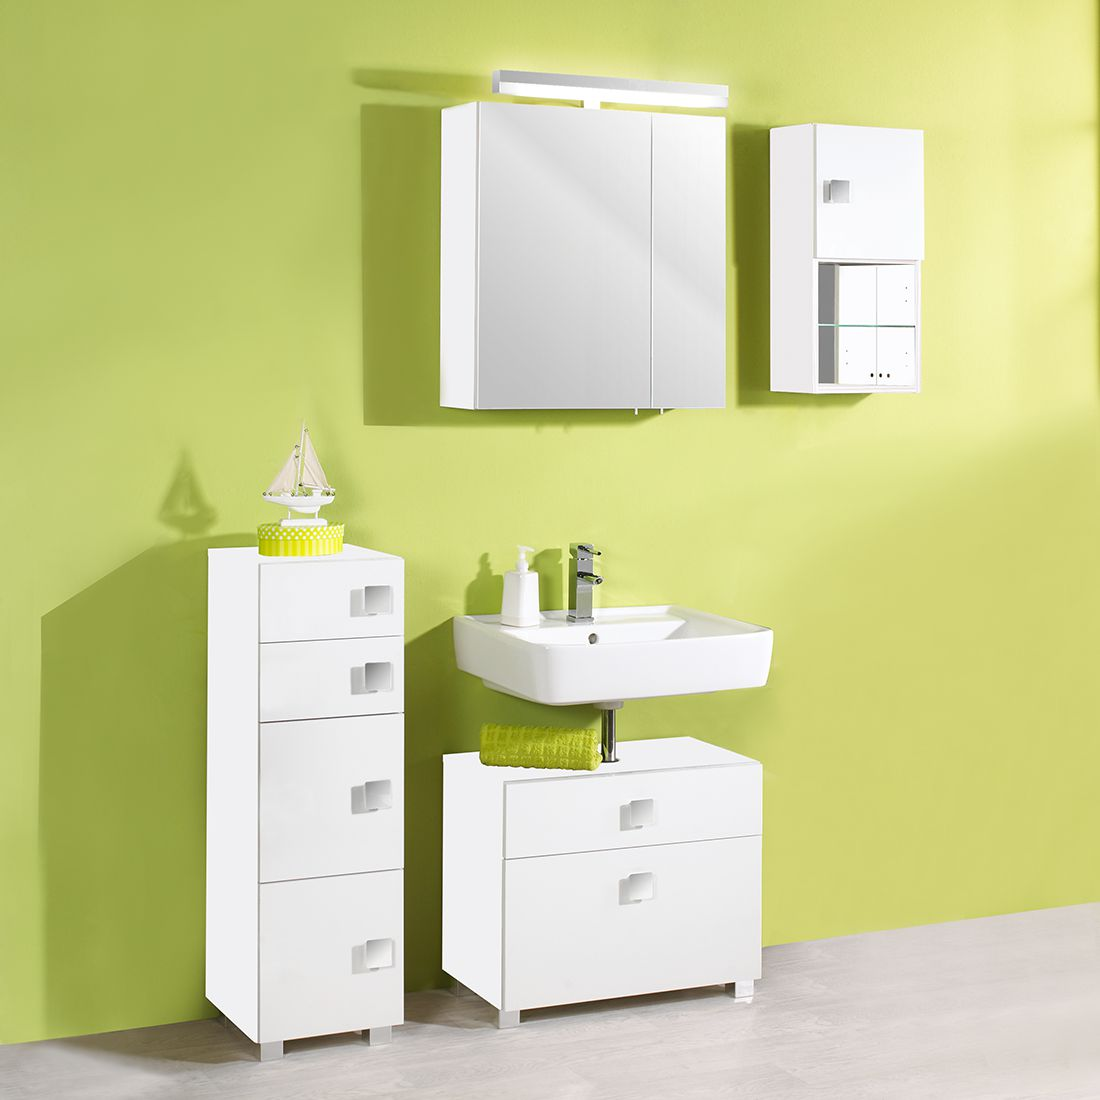 Set di mobili da bagno Genf - Bianco lucido/Bianco Set di 3 mobili da bagno Genf - Bianco lucido/Bianco, Schildmeyer